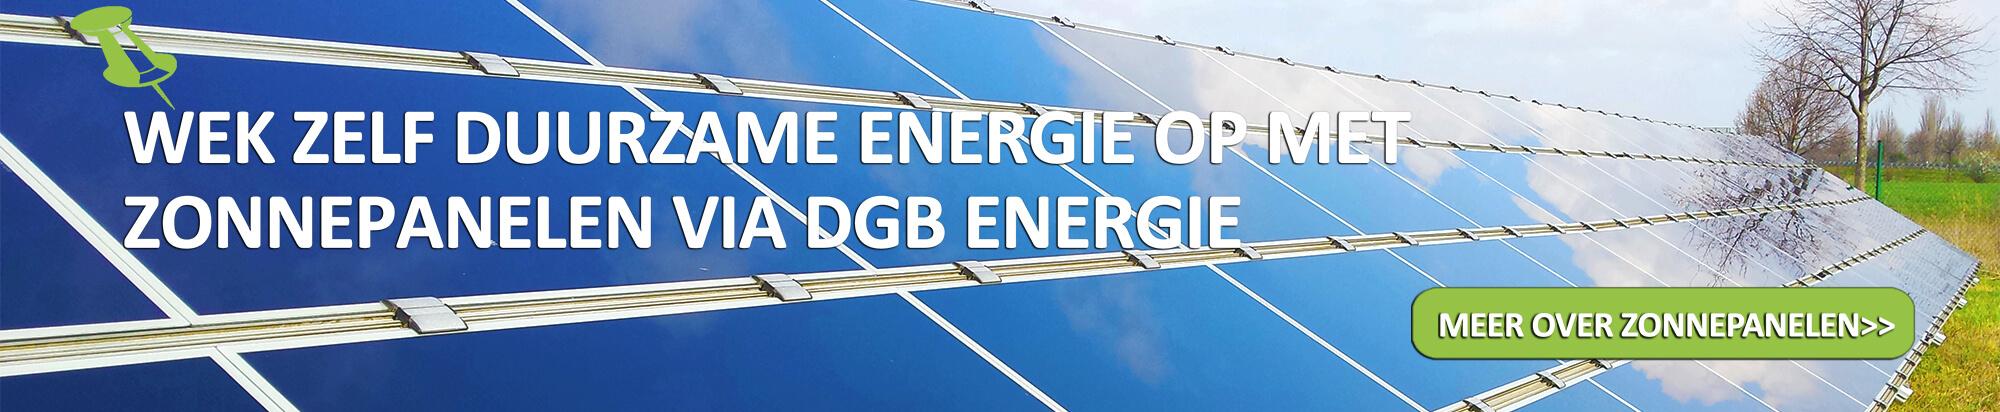 zonnepanelen kopen via dgb energie